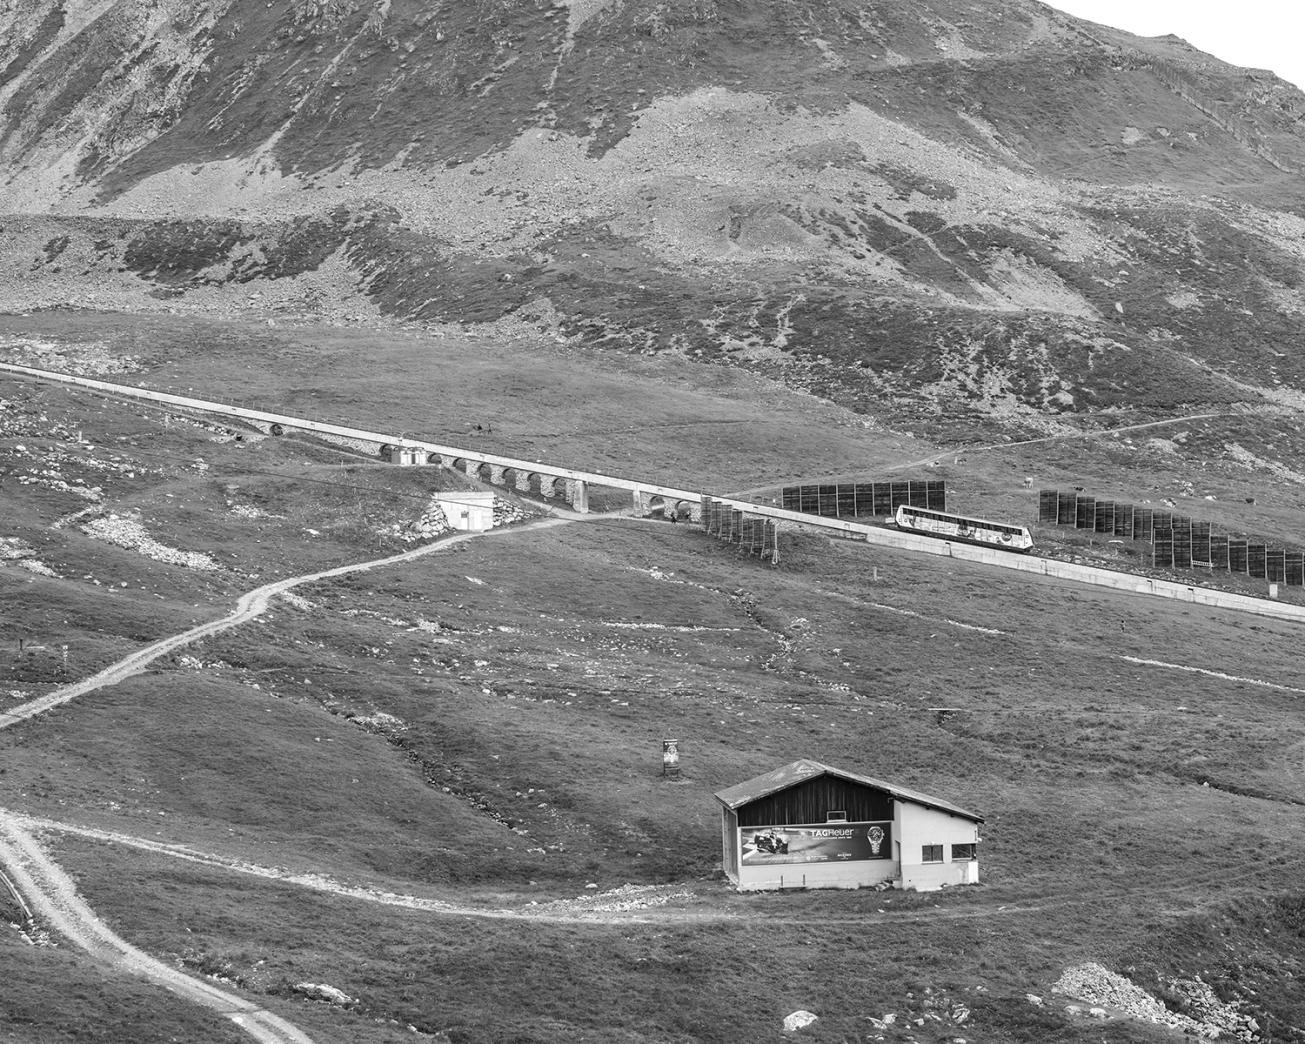 klosters_strelapass-11